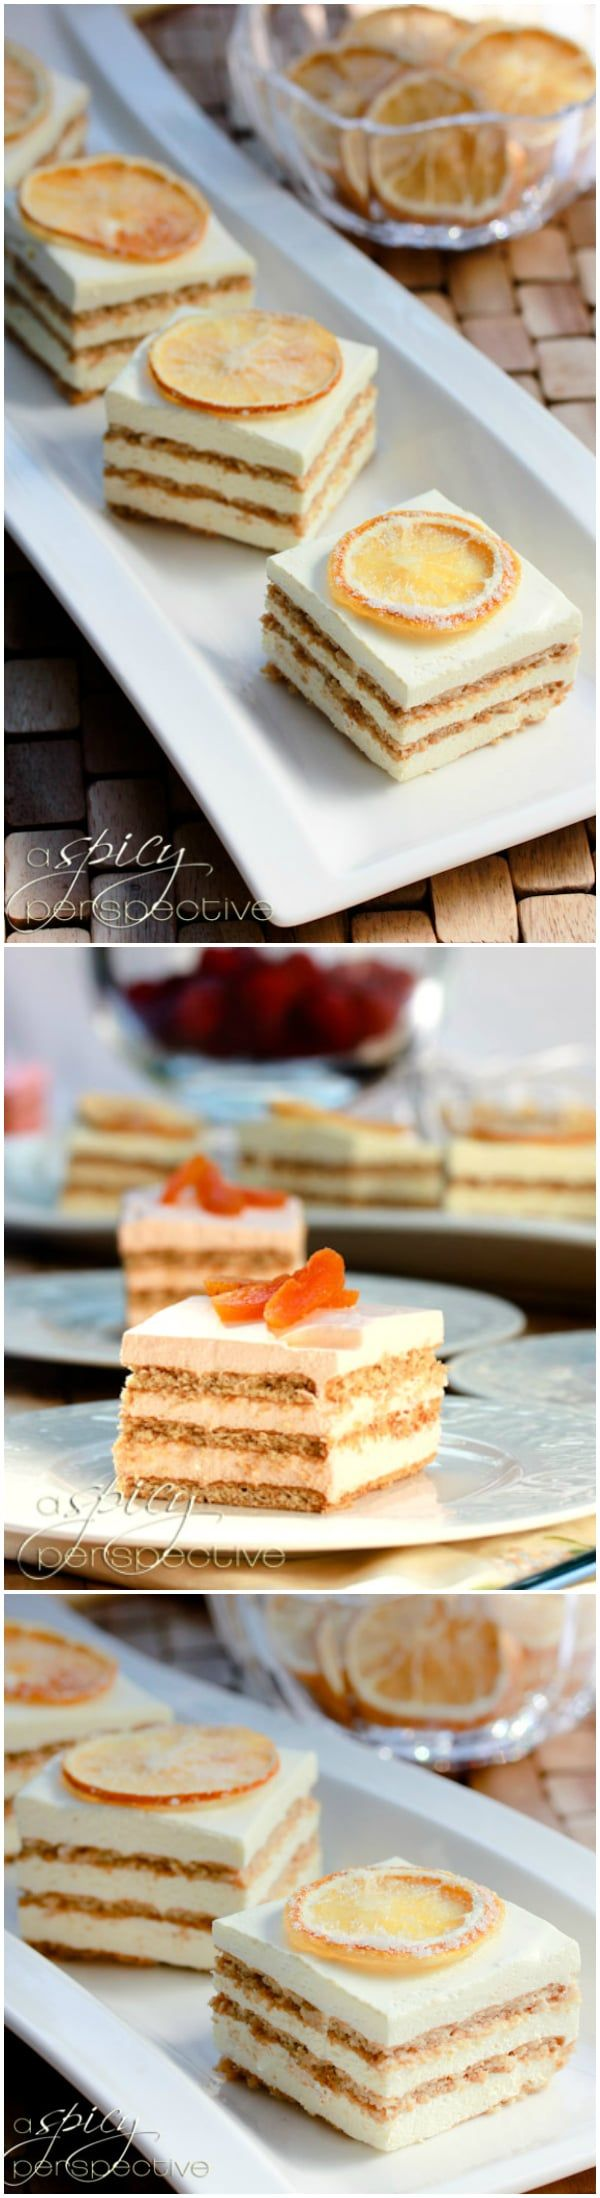 Layered Jello Mousse Cake Recipe Icebox Cakes Pinterest Cake